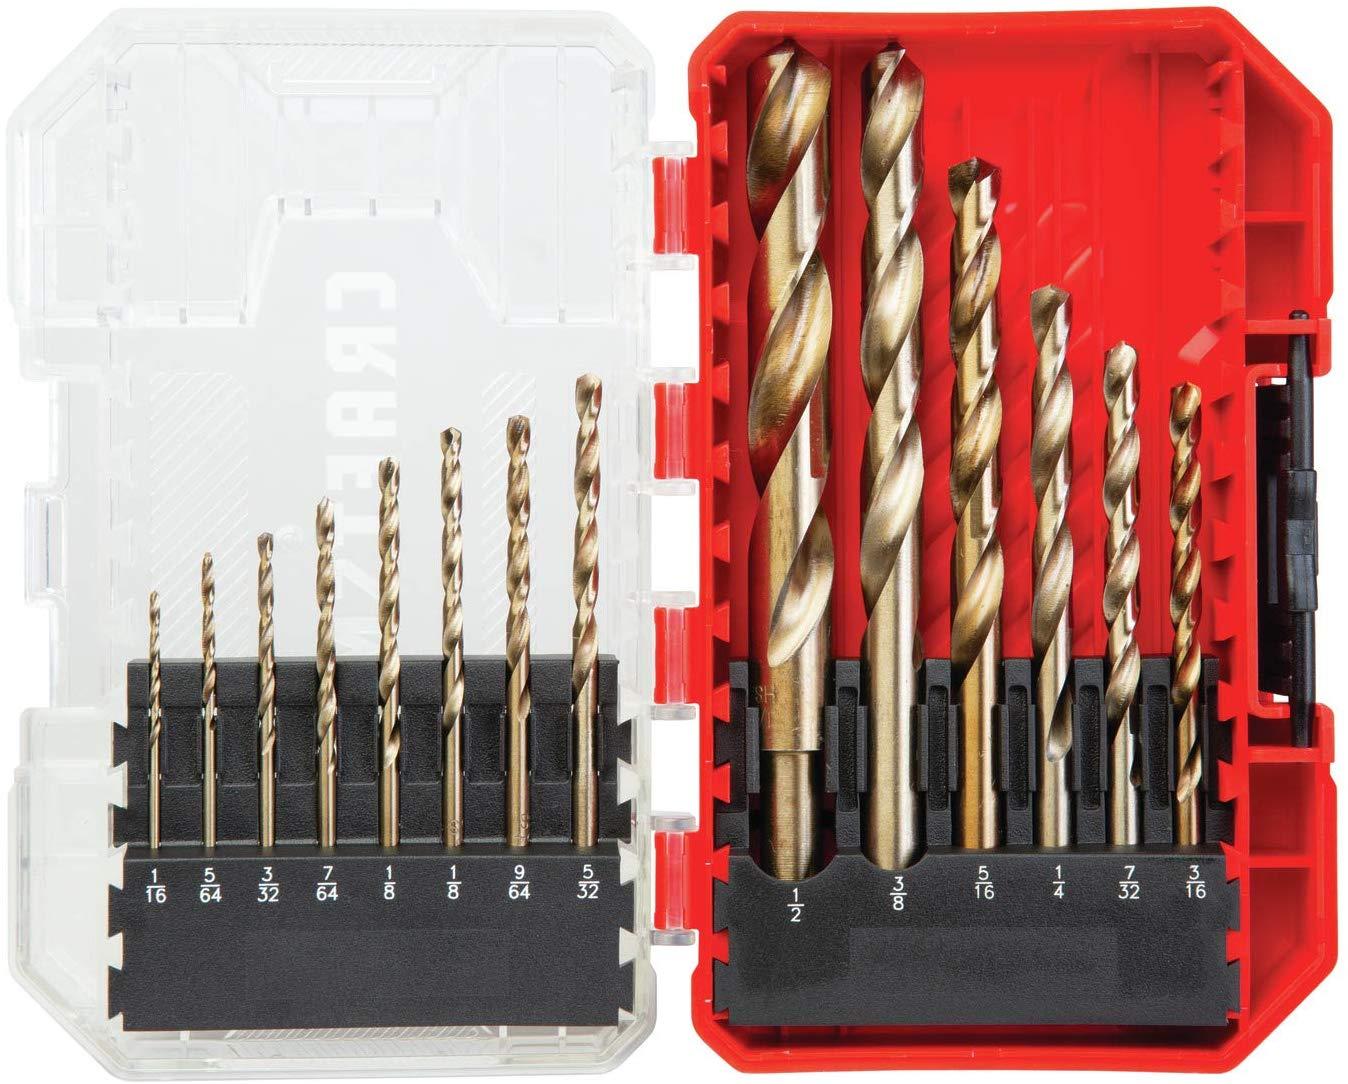 CRAFTSMAN Drill Bit Set, Gold Oxide, 14-Piece (CMAM2214) - $8.78 at Amazon + FS with Prime